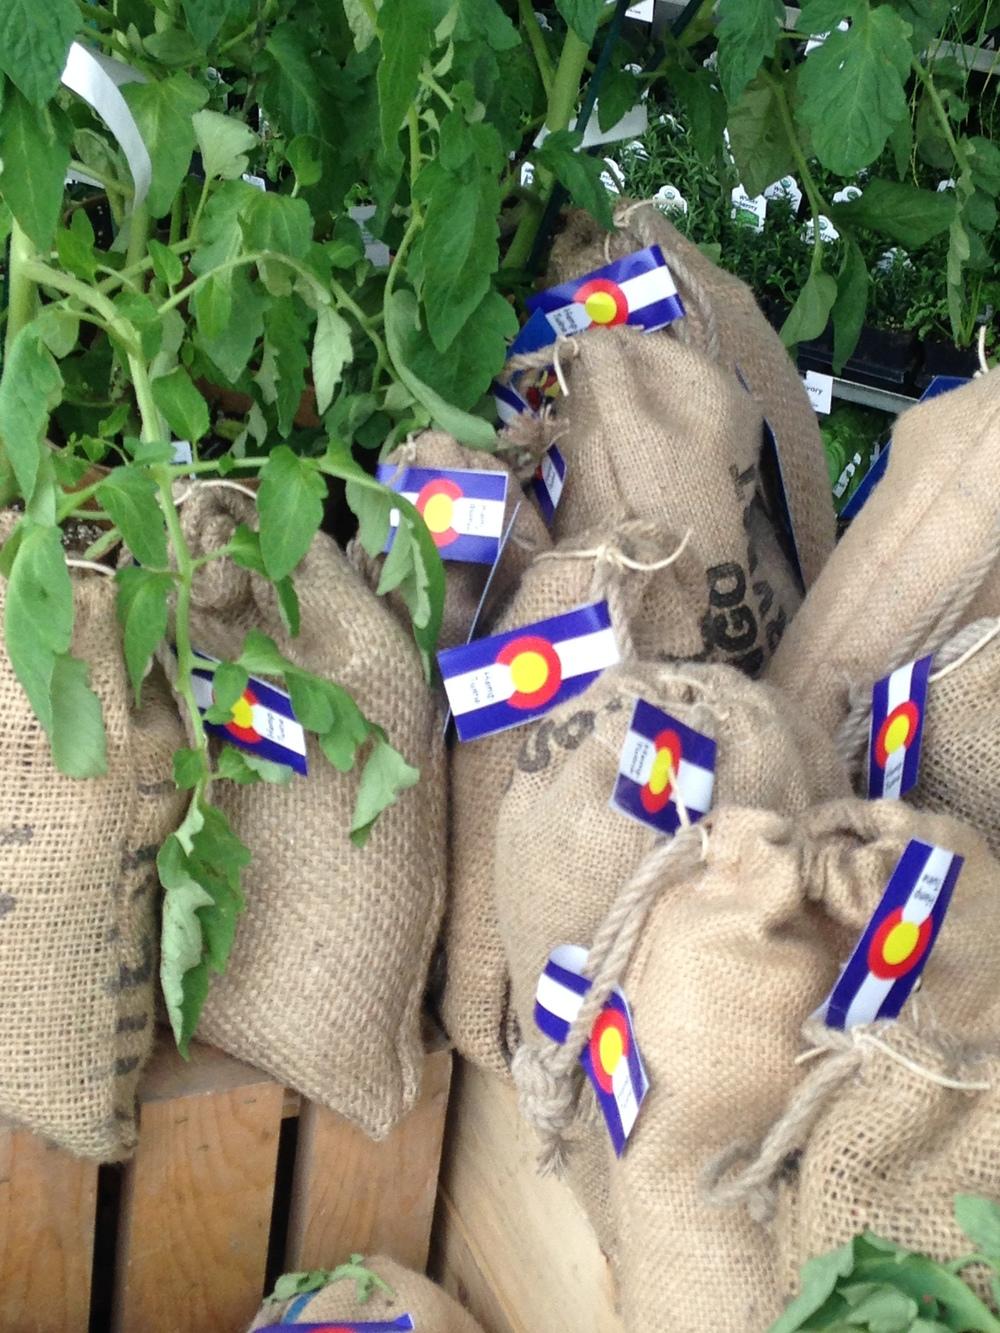 Home grown Tomato plants. Gotta love the Colorado Flag.